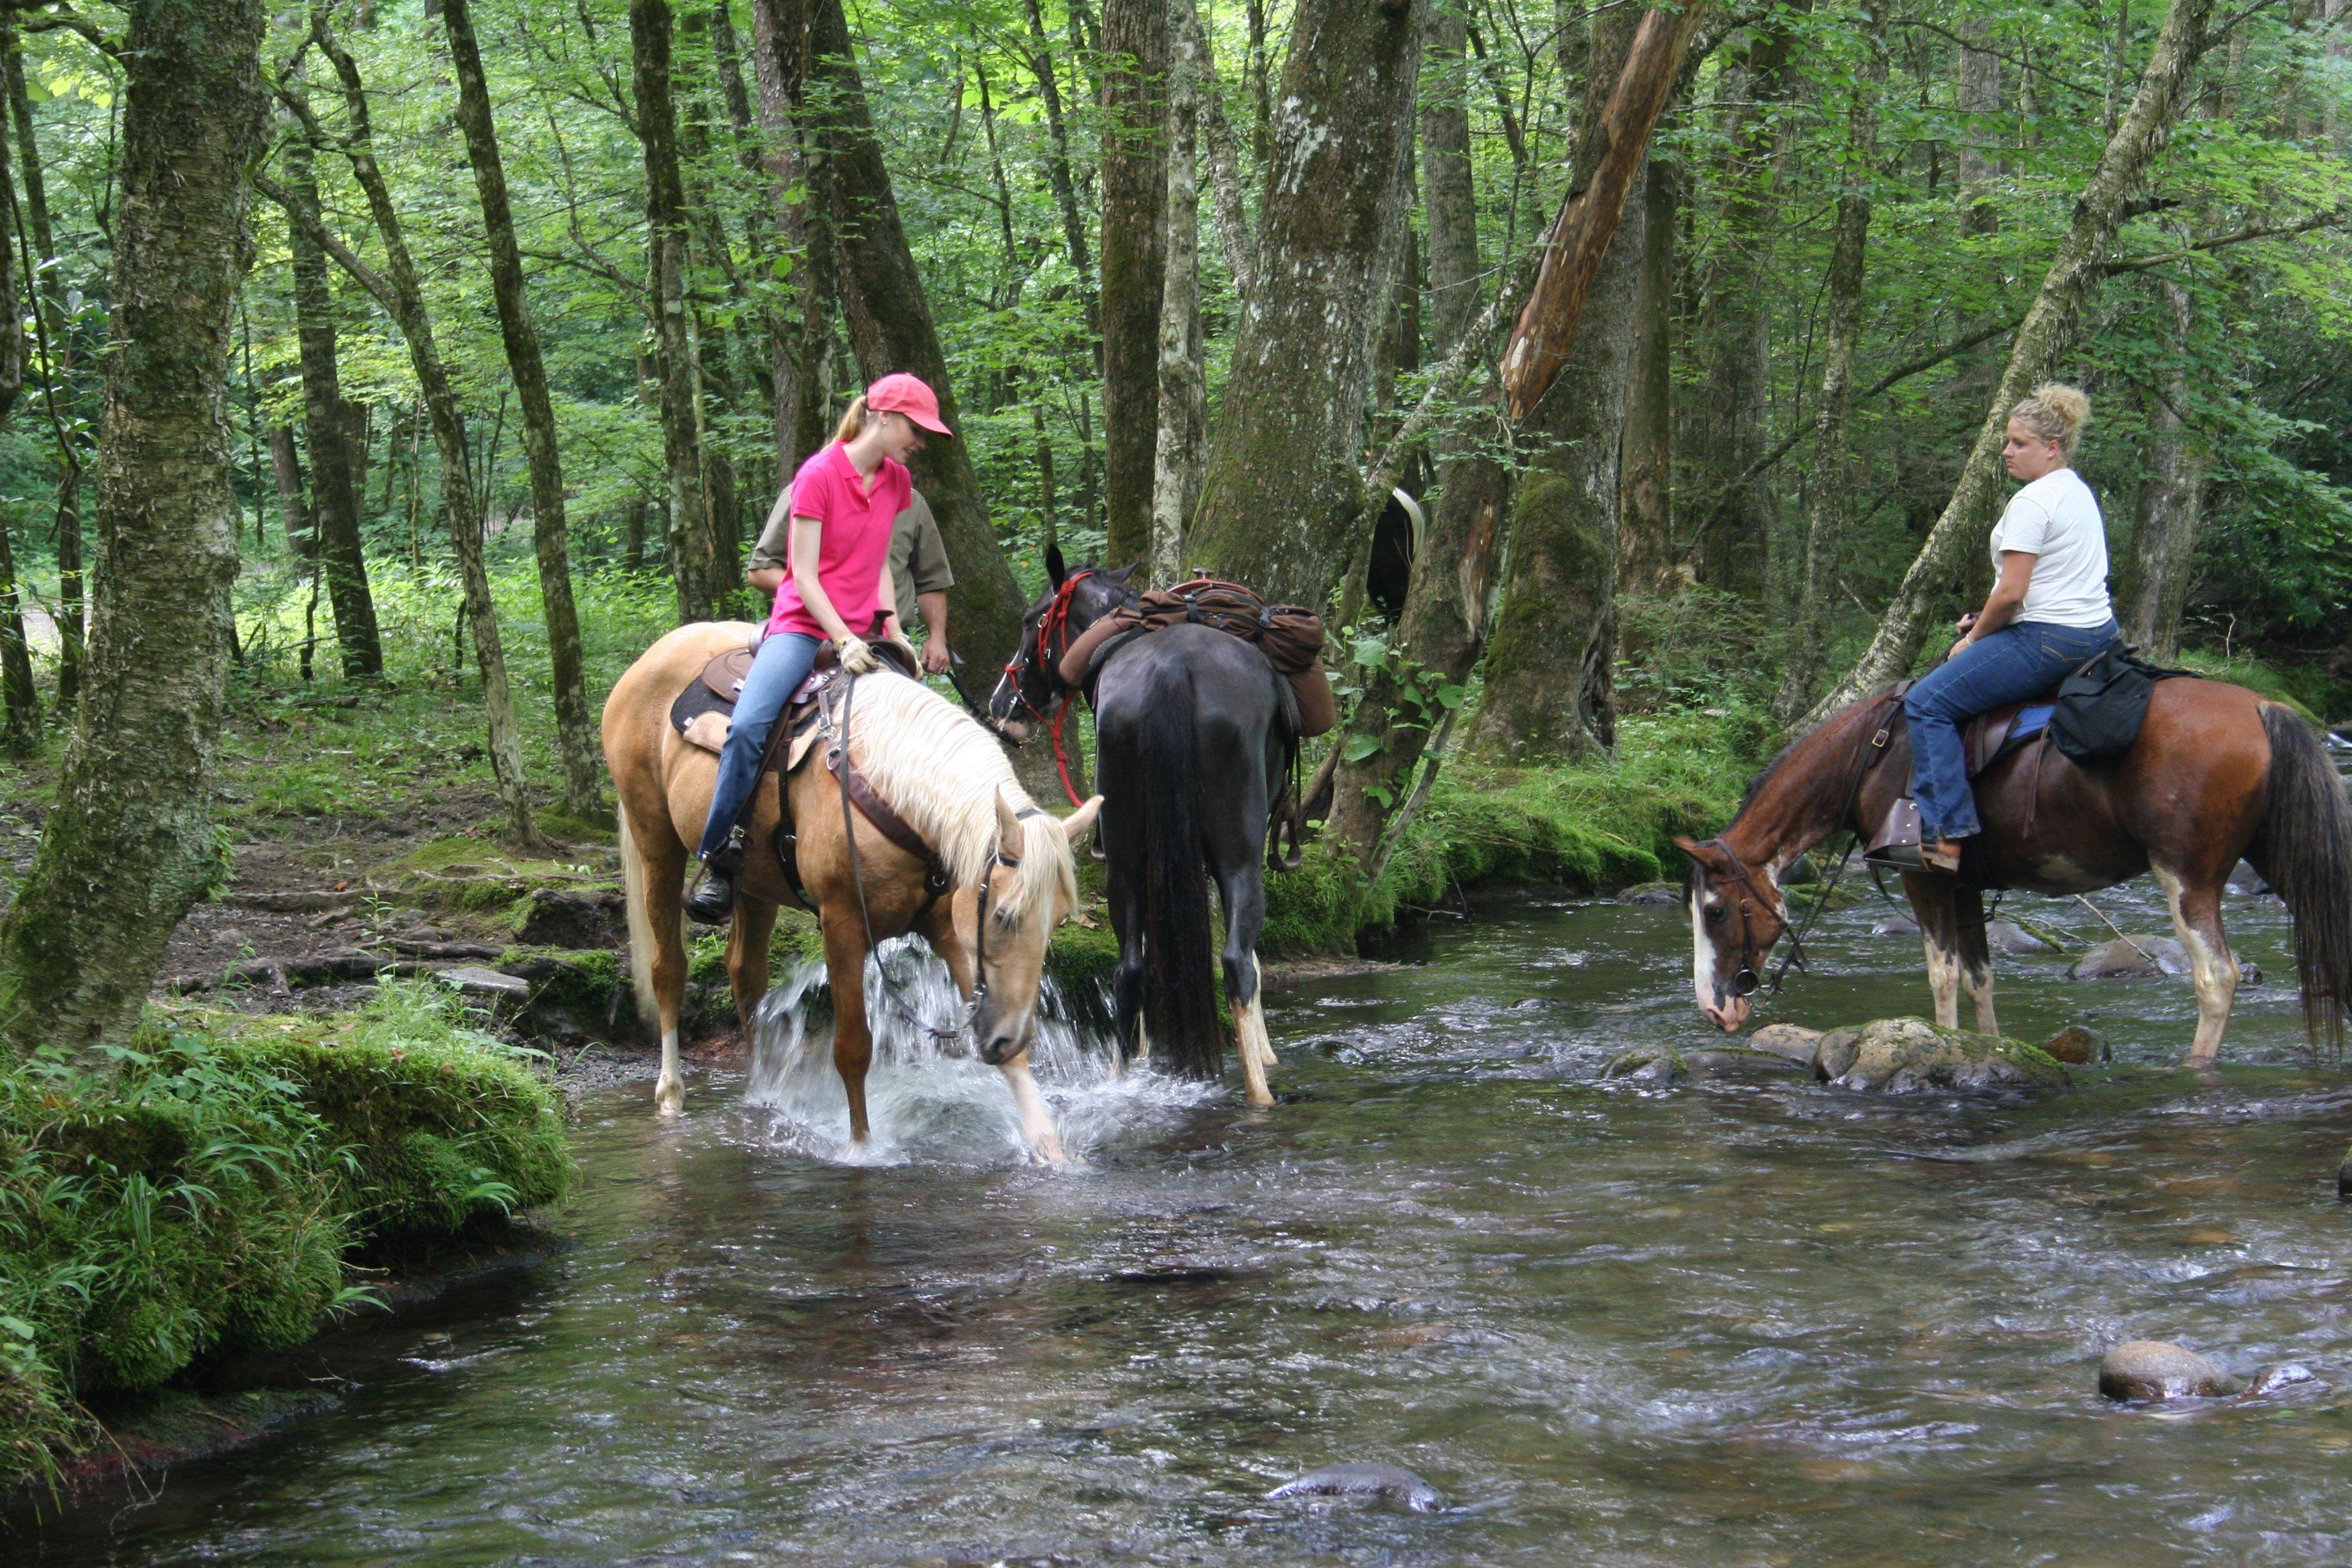 Equitrekking TV Series Explores on Horseback - Expert